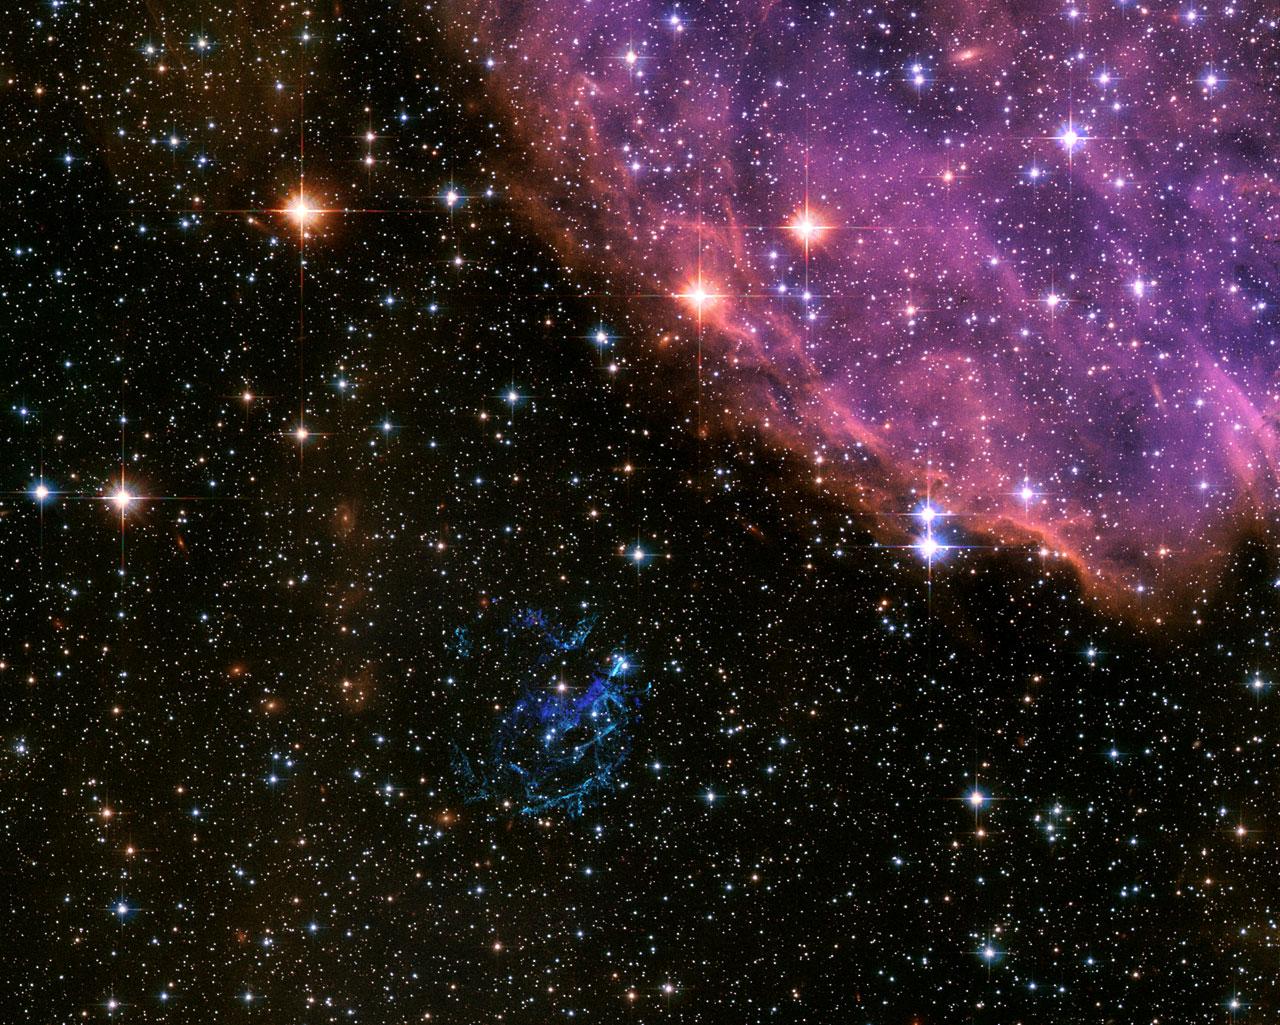 Cosmic Explosion Like Fireworks!